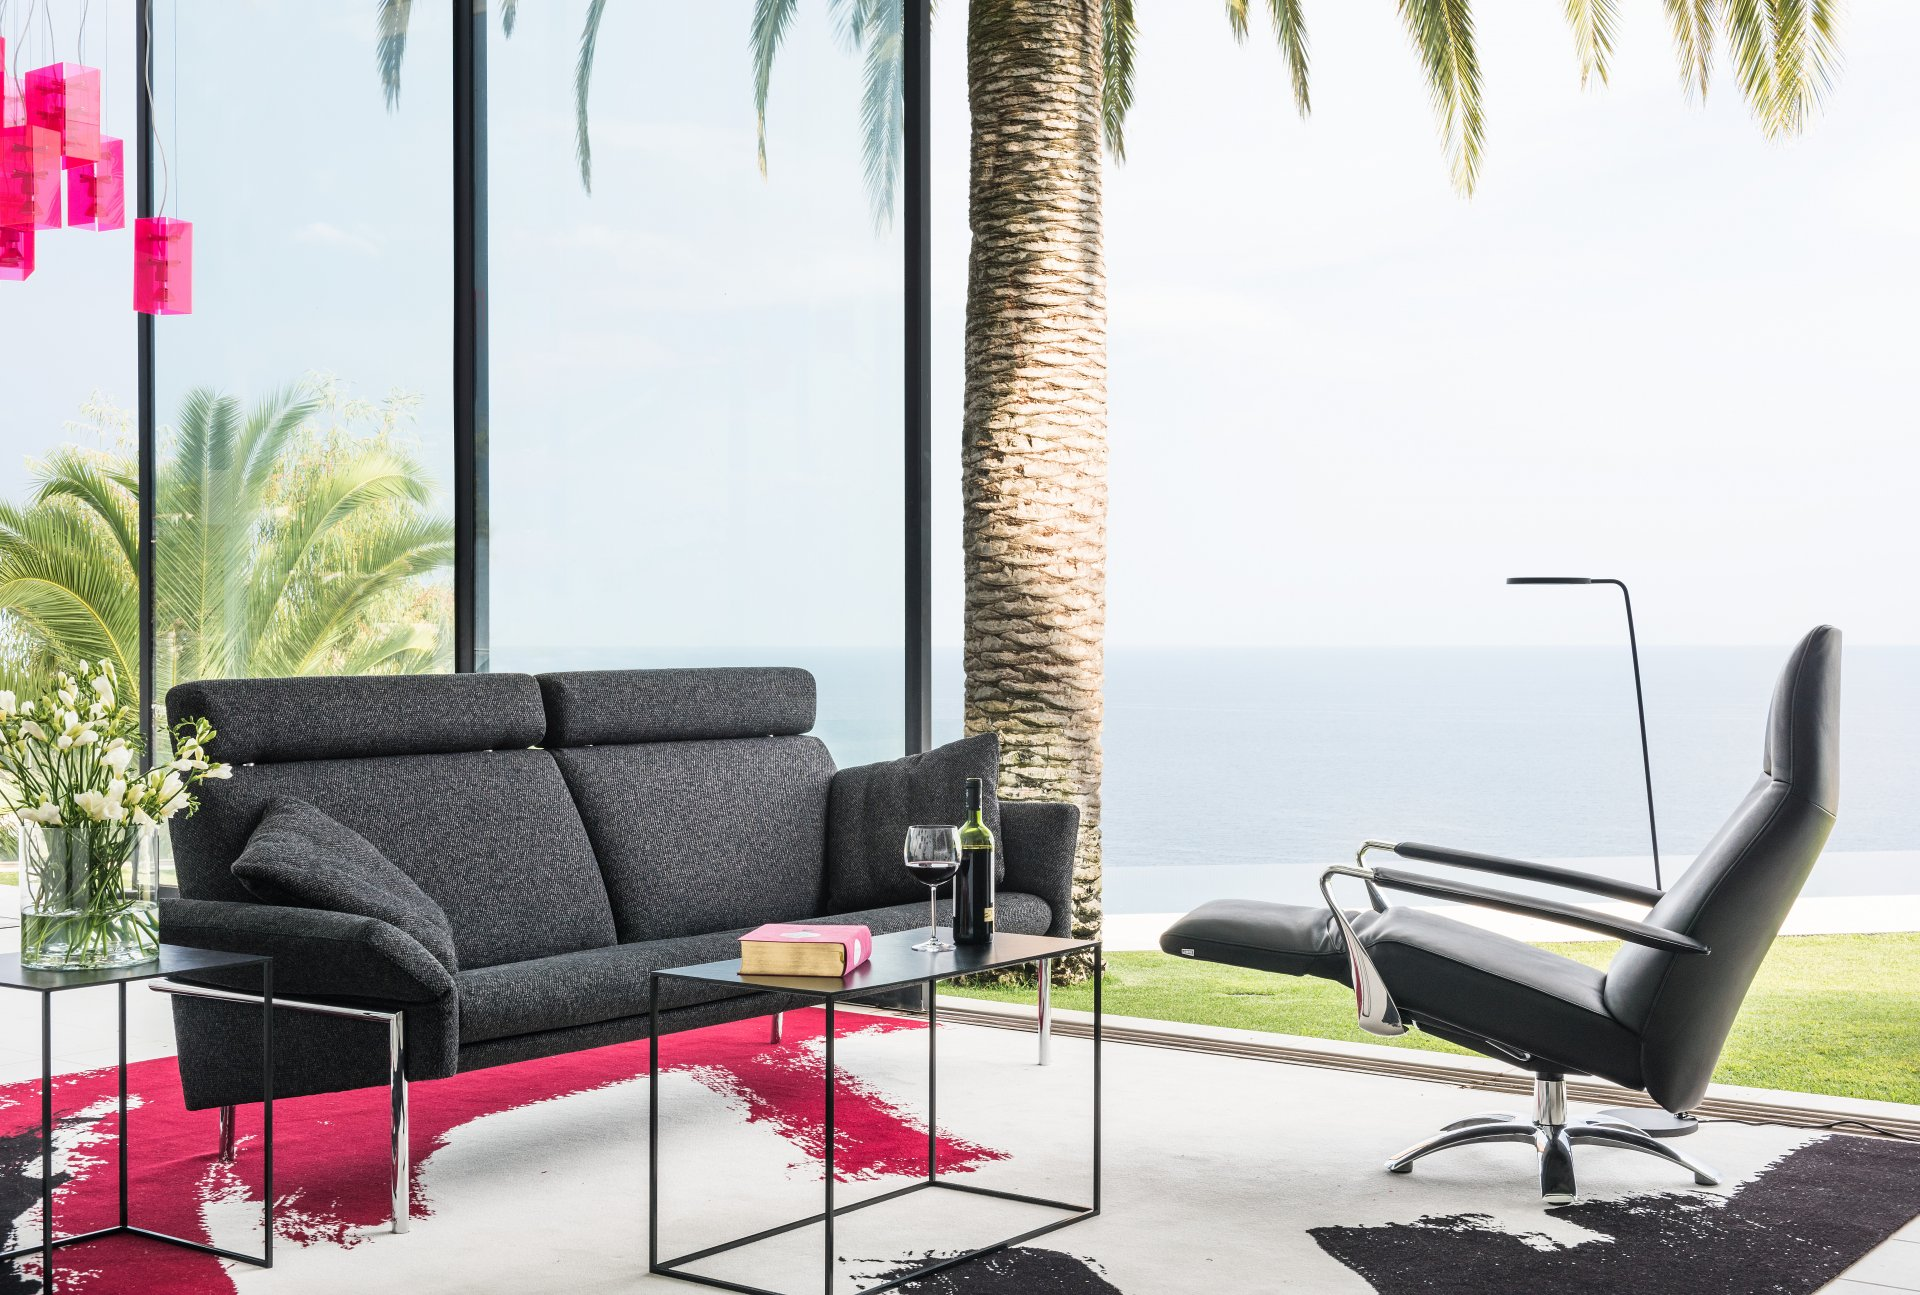 Industrial Mobel Couch – Caseconrad.com